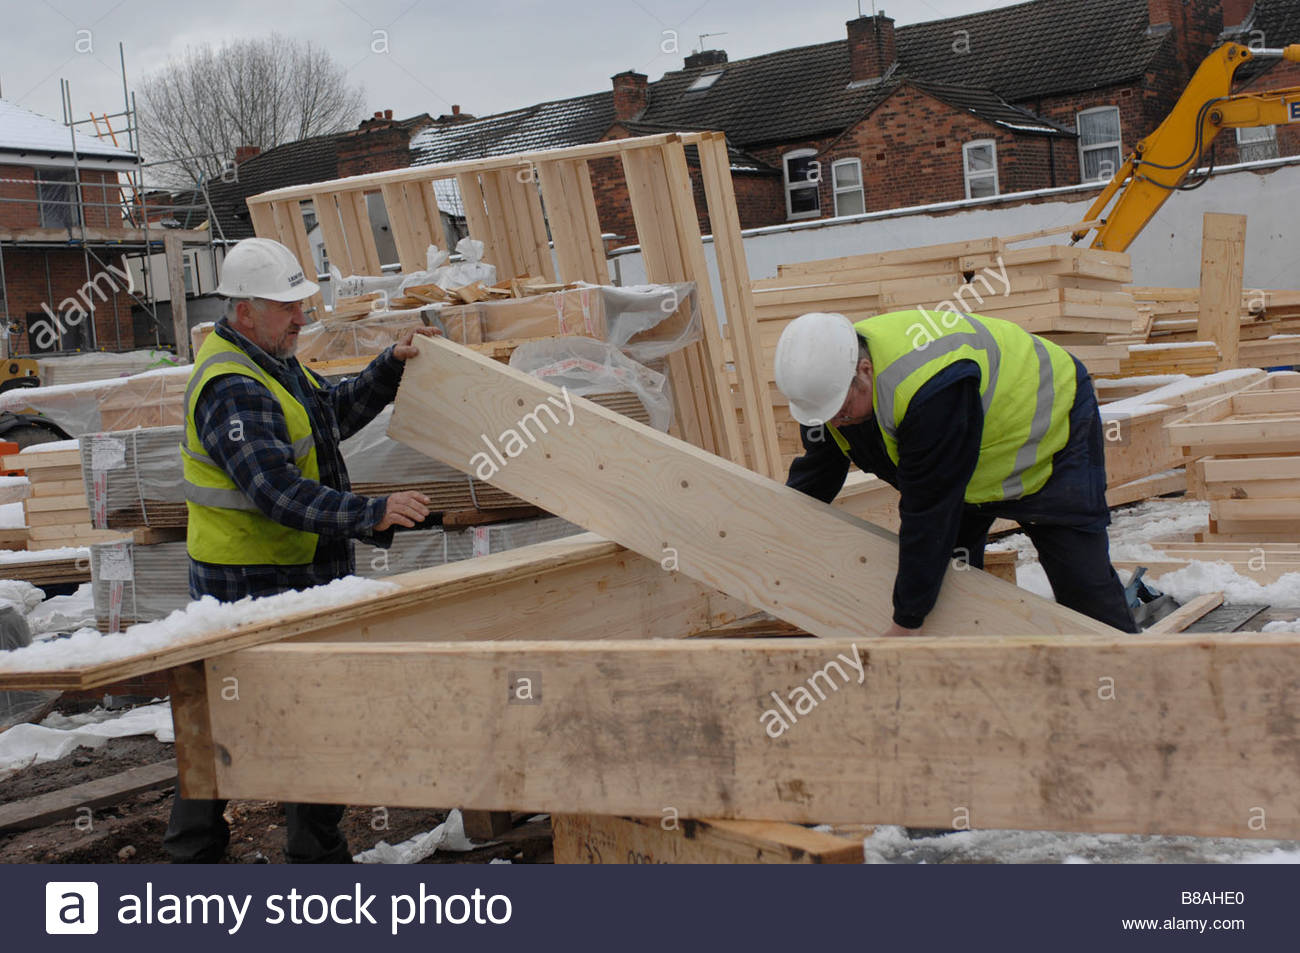 Erecting Building Stockfotos & Erecting Building Bilder - Alamy